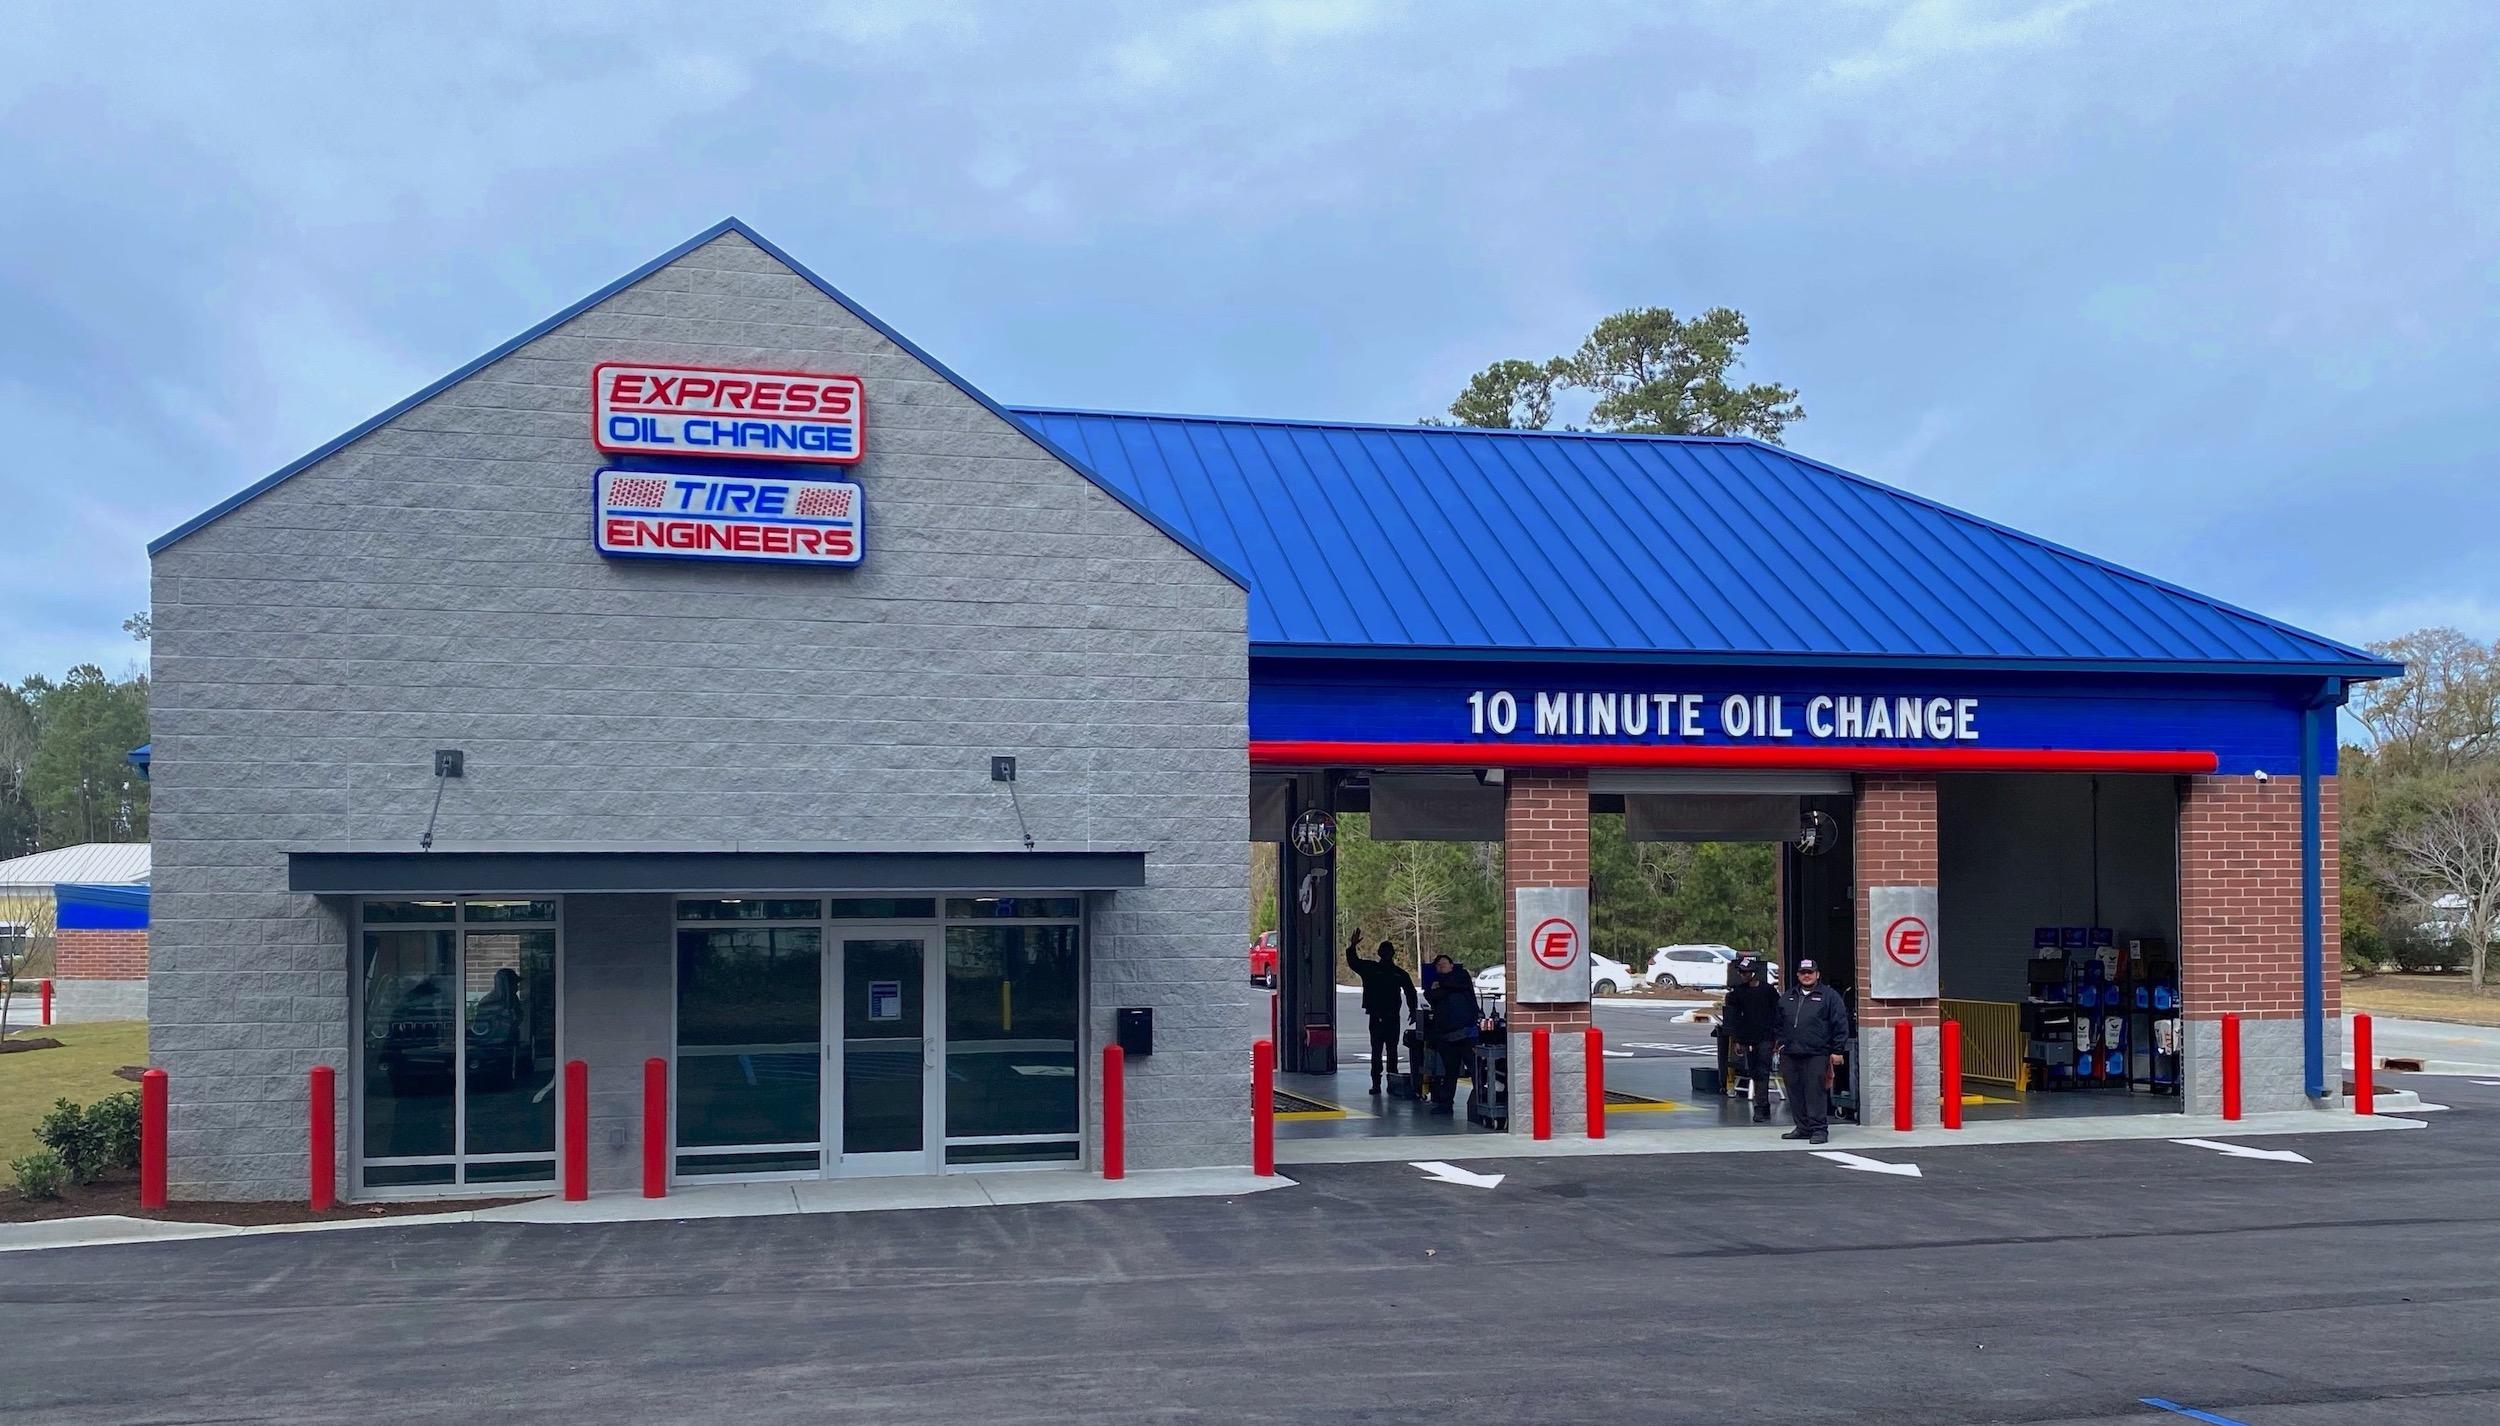 Express Oil Change & Tire Engineers at Savannah, GA - Berwick store